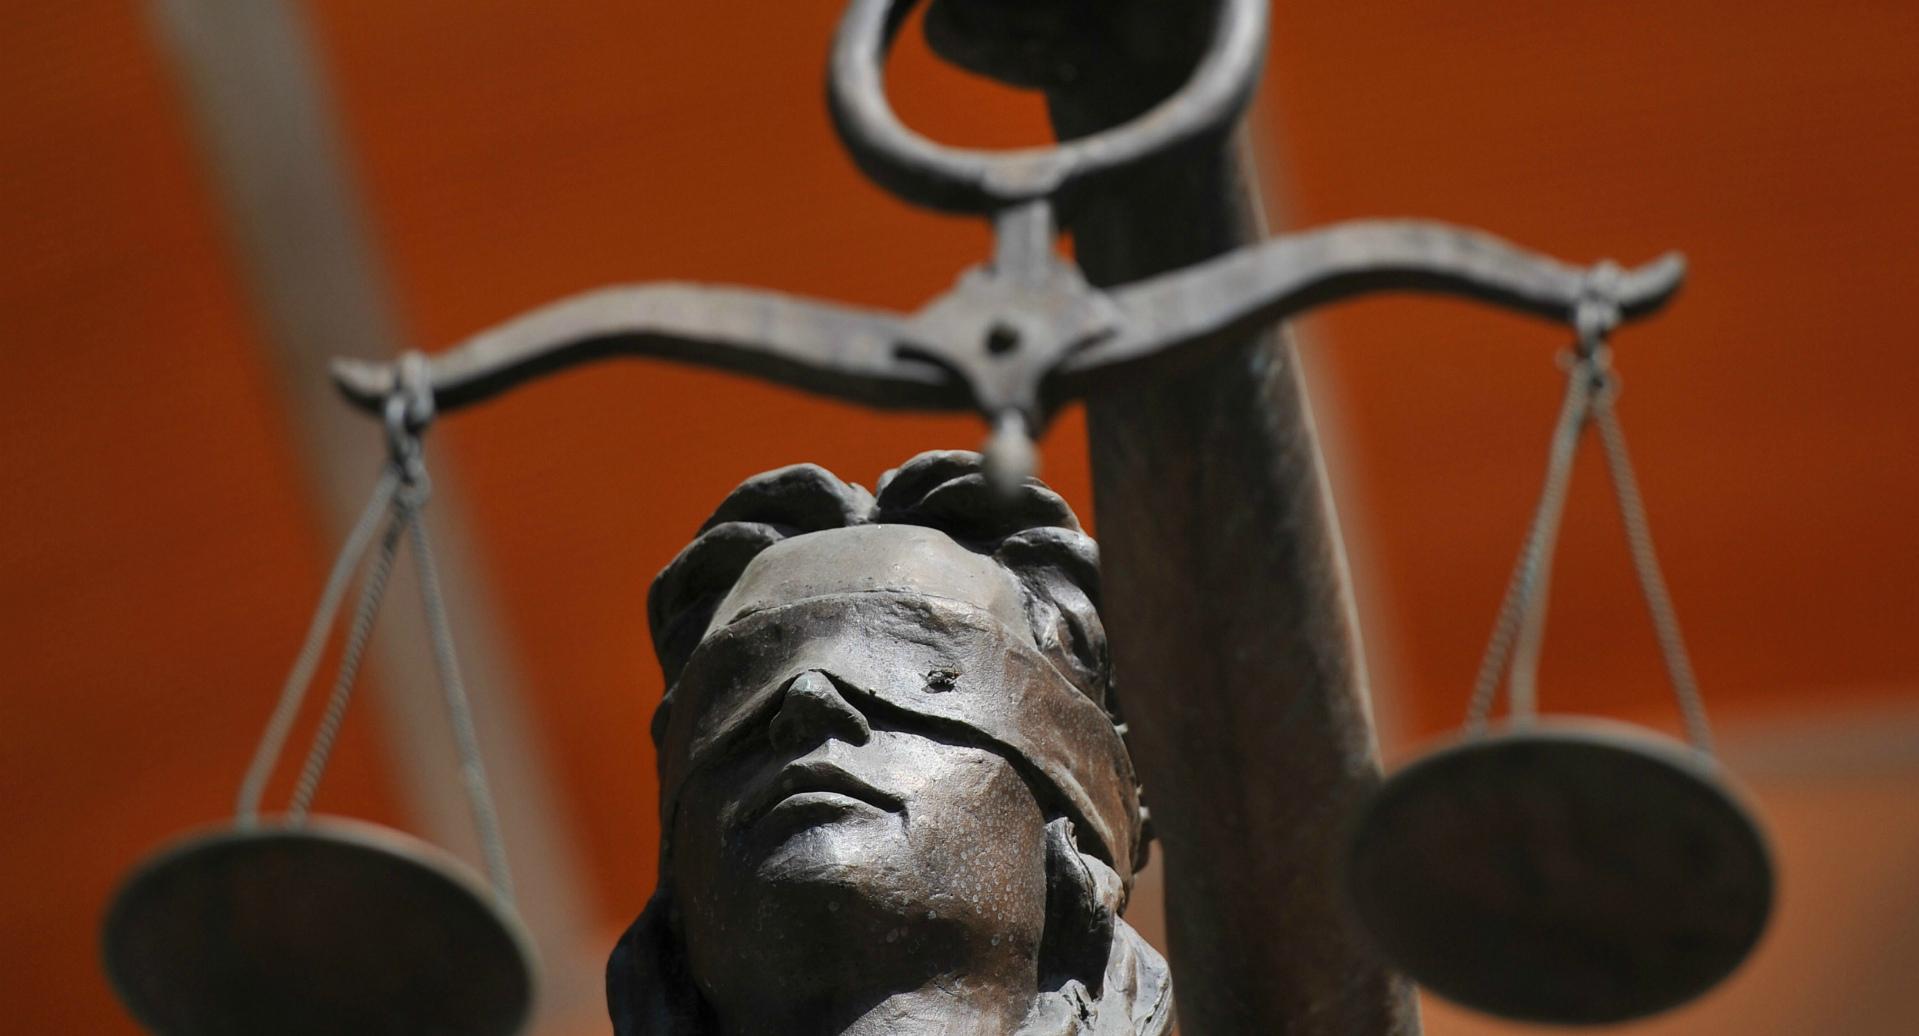 Нападение на гендиректора «Рустави 2»: адвокаты требуют переквалификации дела